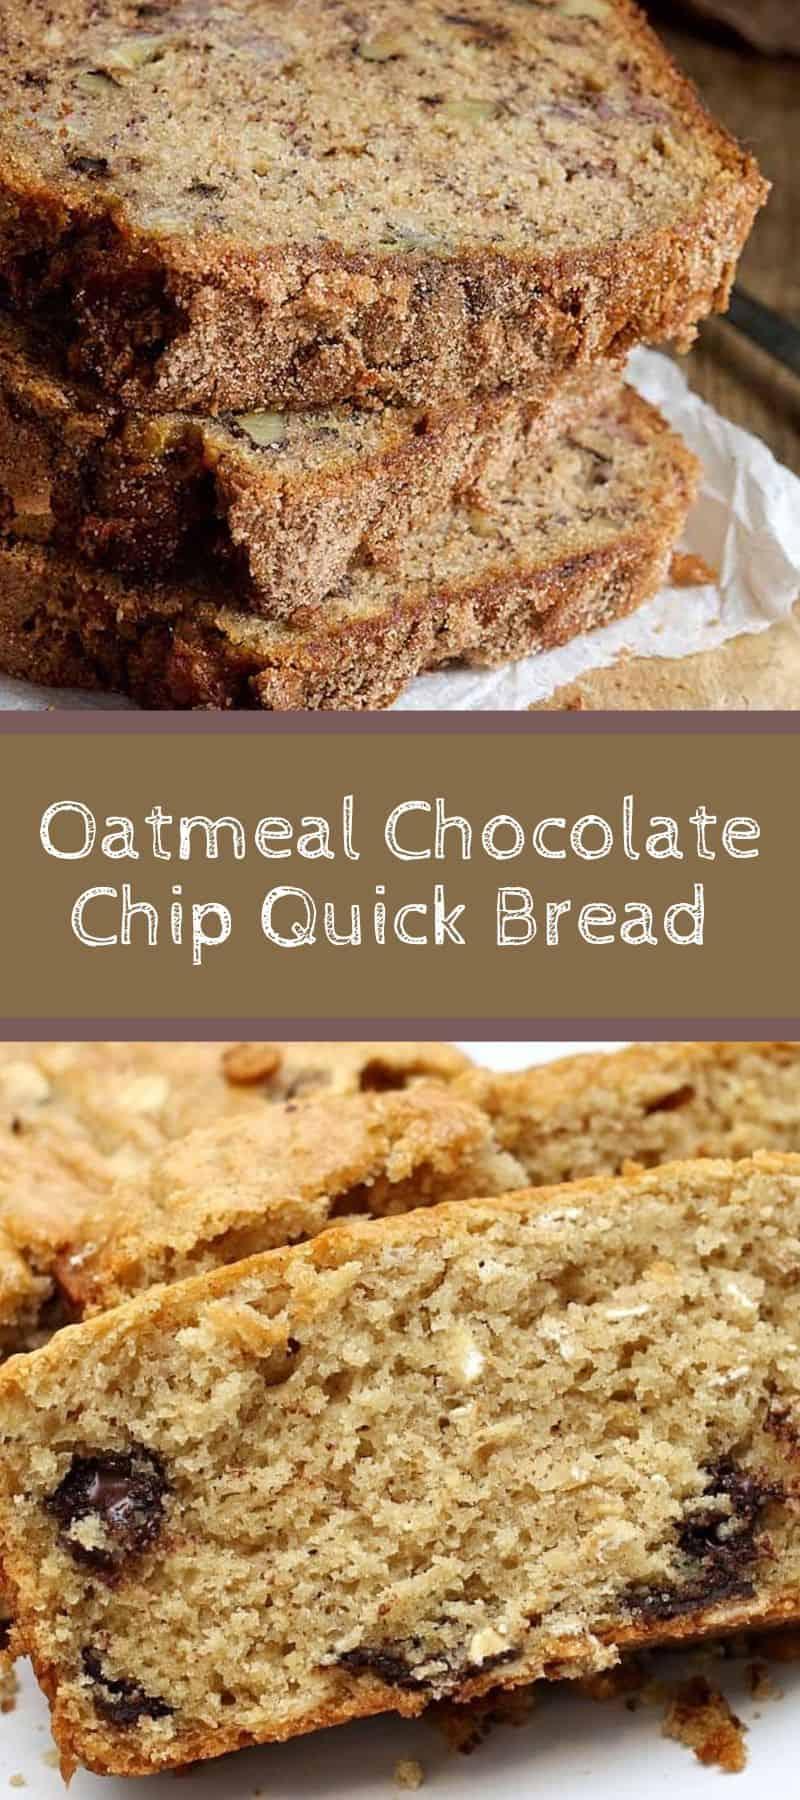 Oatmeal Chocolate Chip Quick Bread Recipe 3